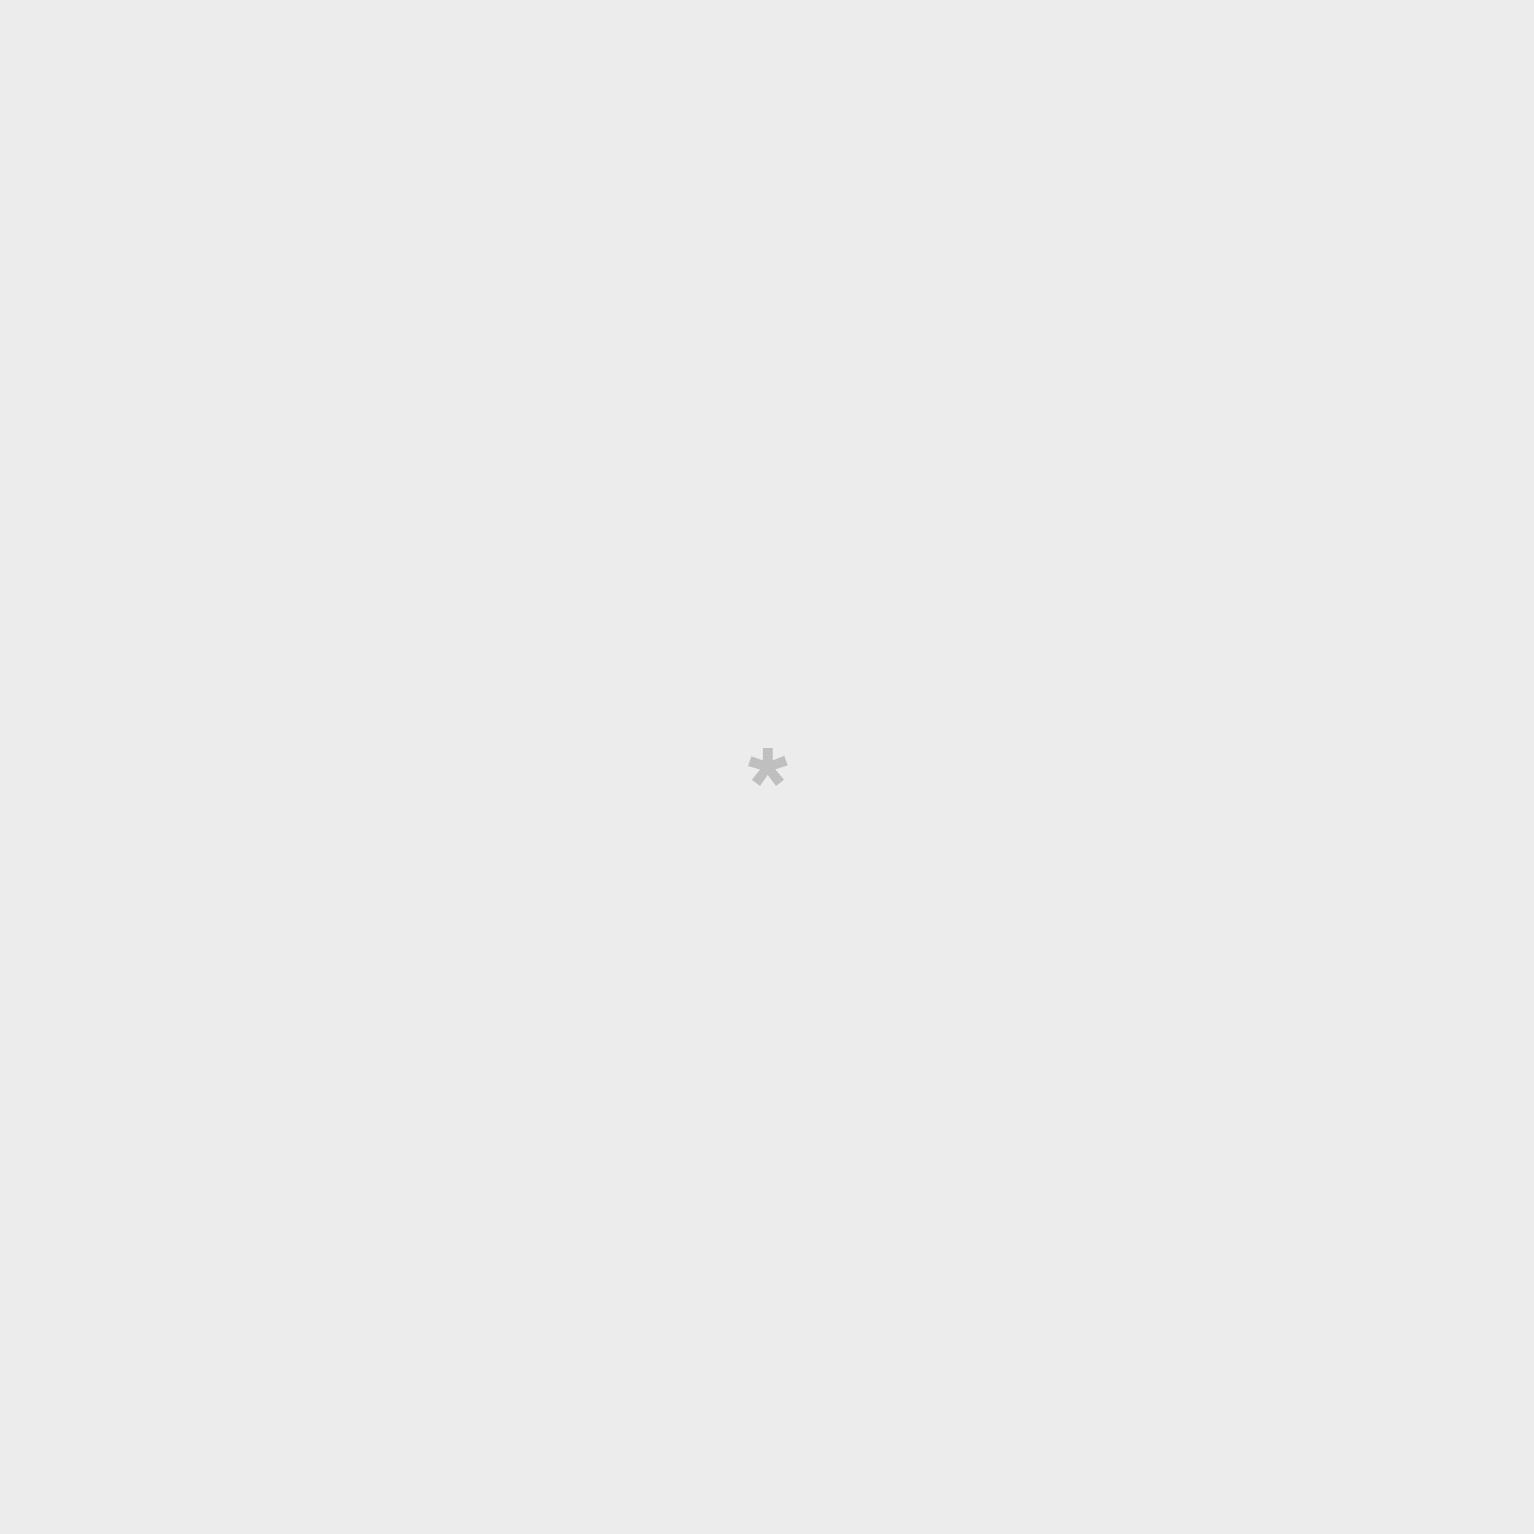 Beach towel - Yo en modo tropical